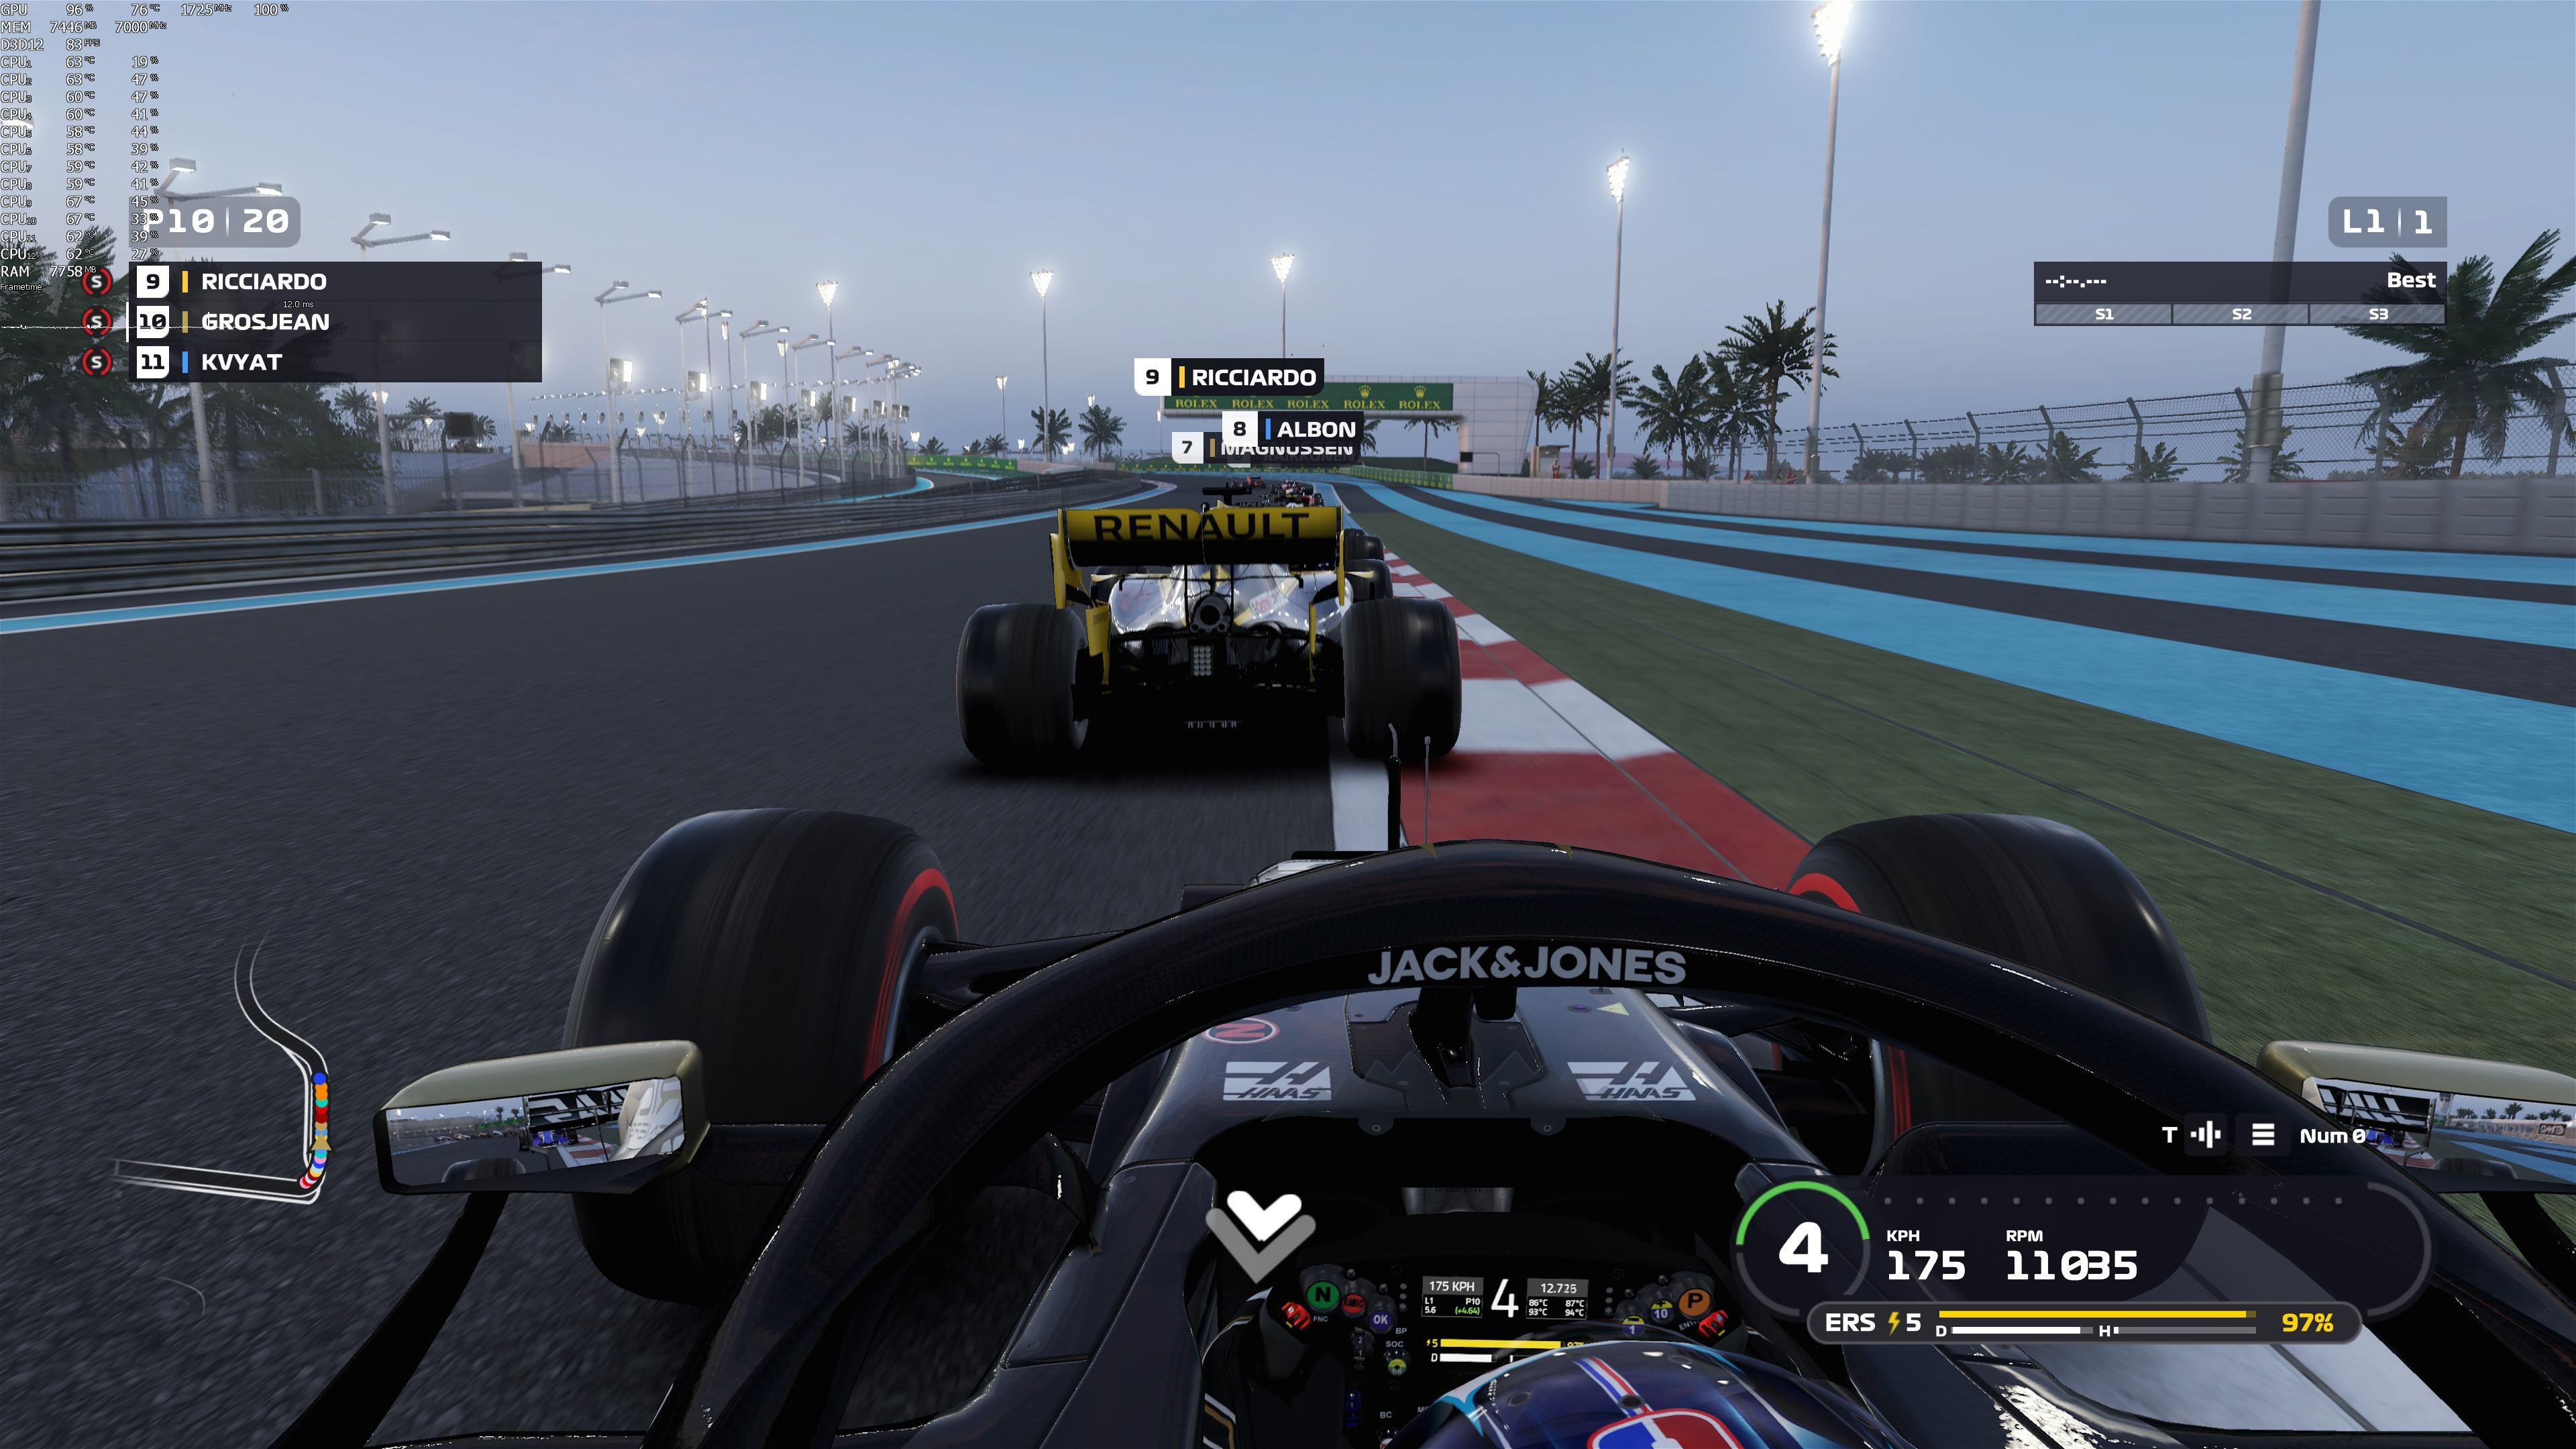 《F1 2019》是迄今为止画面最益的F1赛车嬉戏